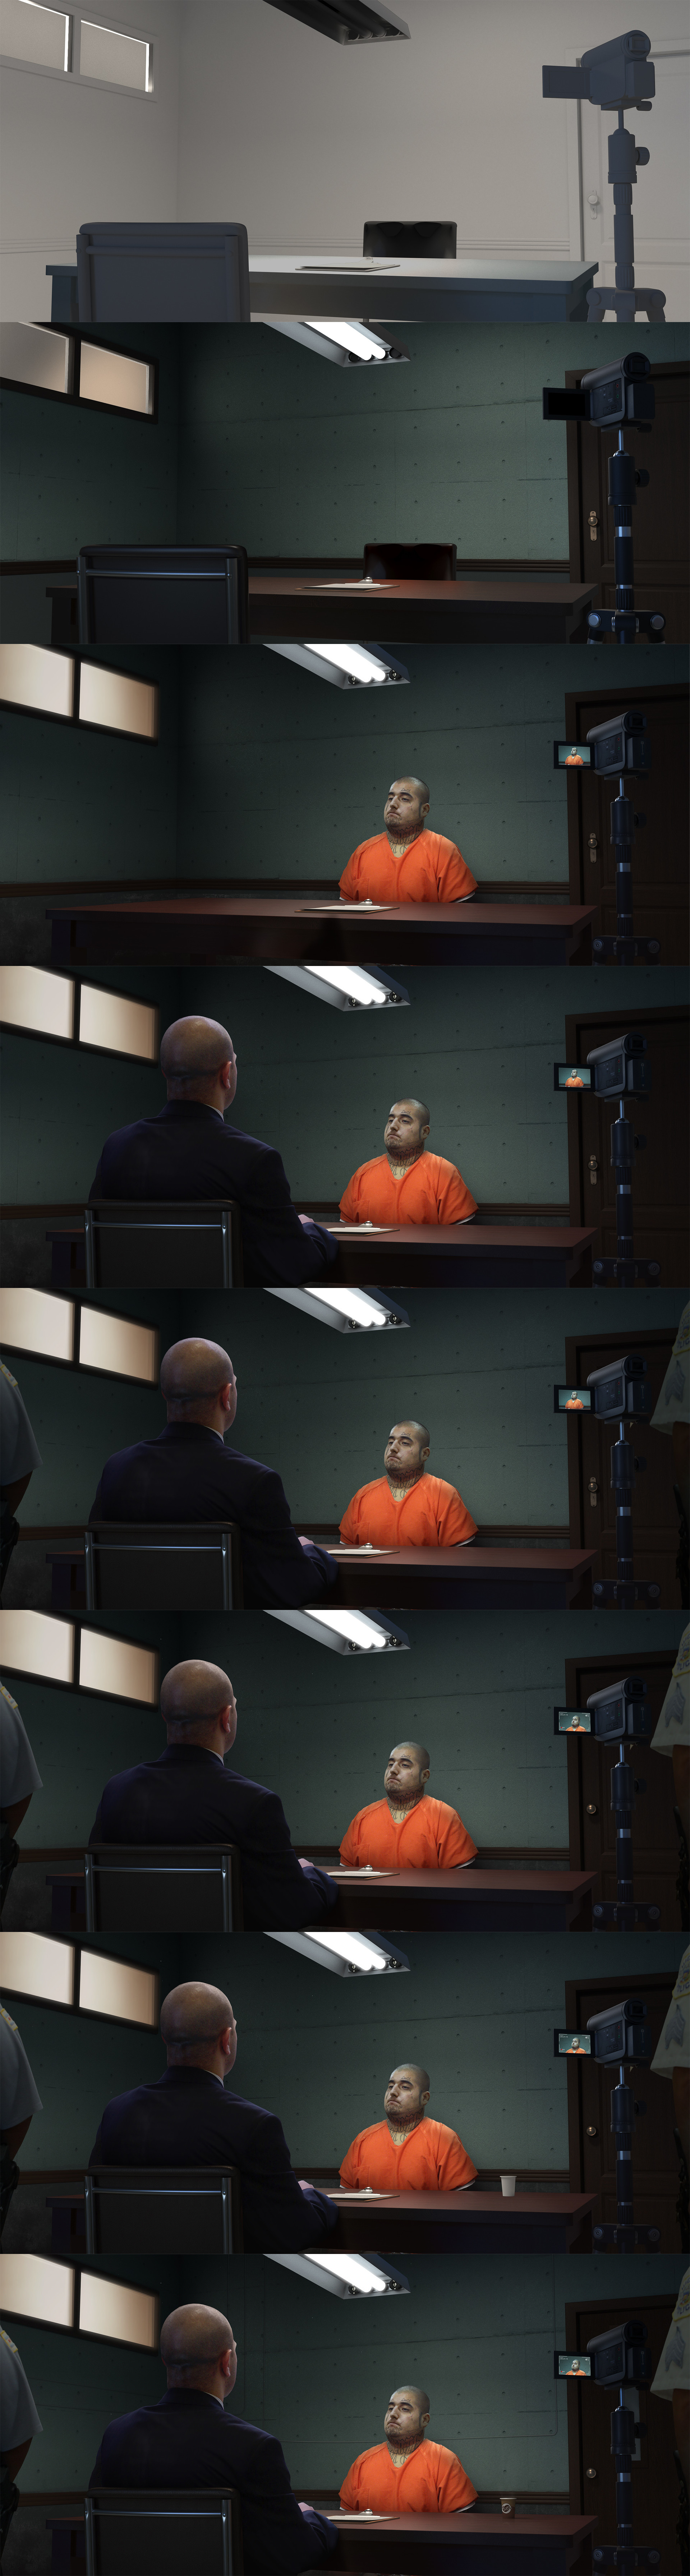 Pavel proskurin interrogation proc